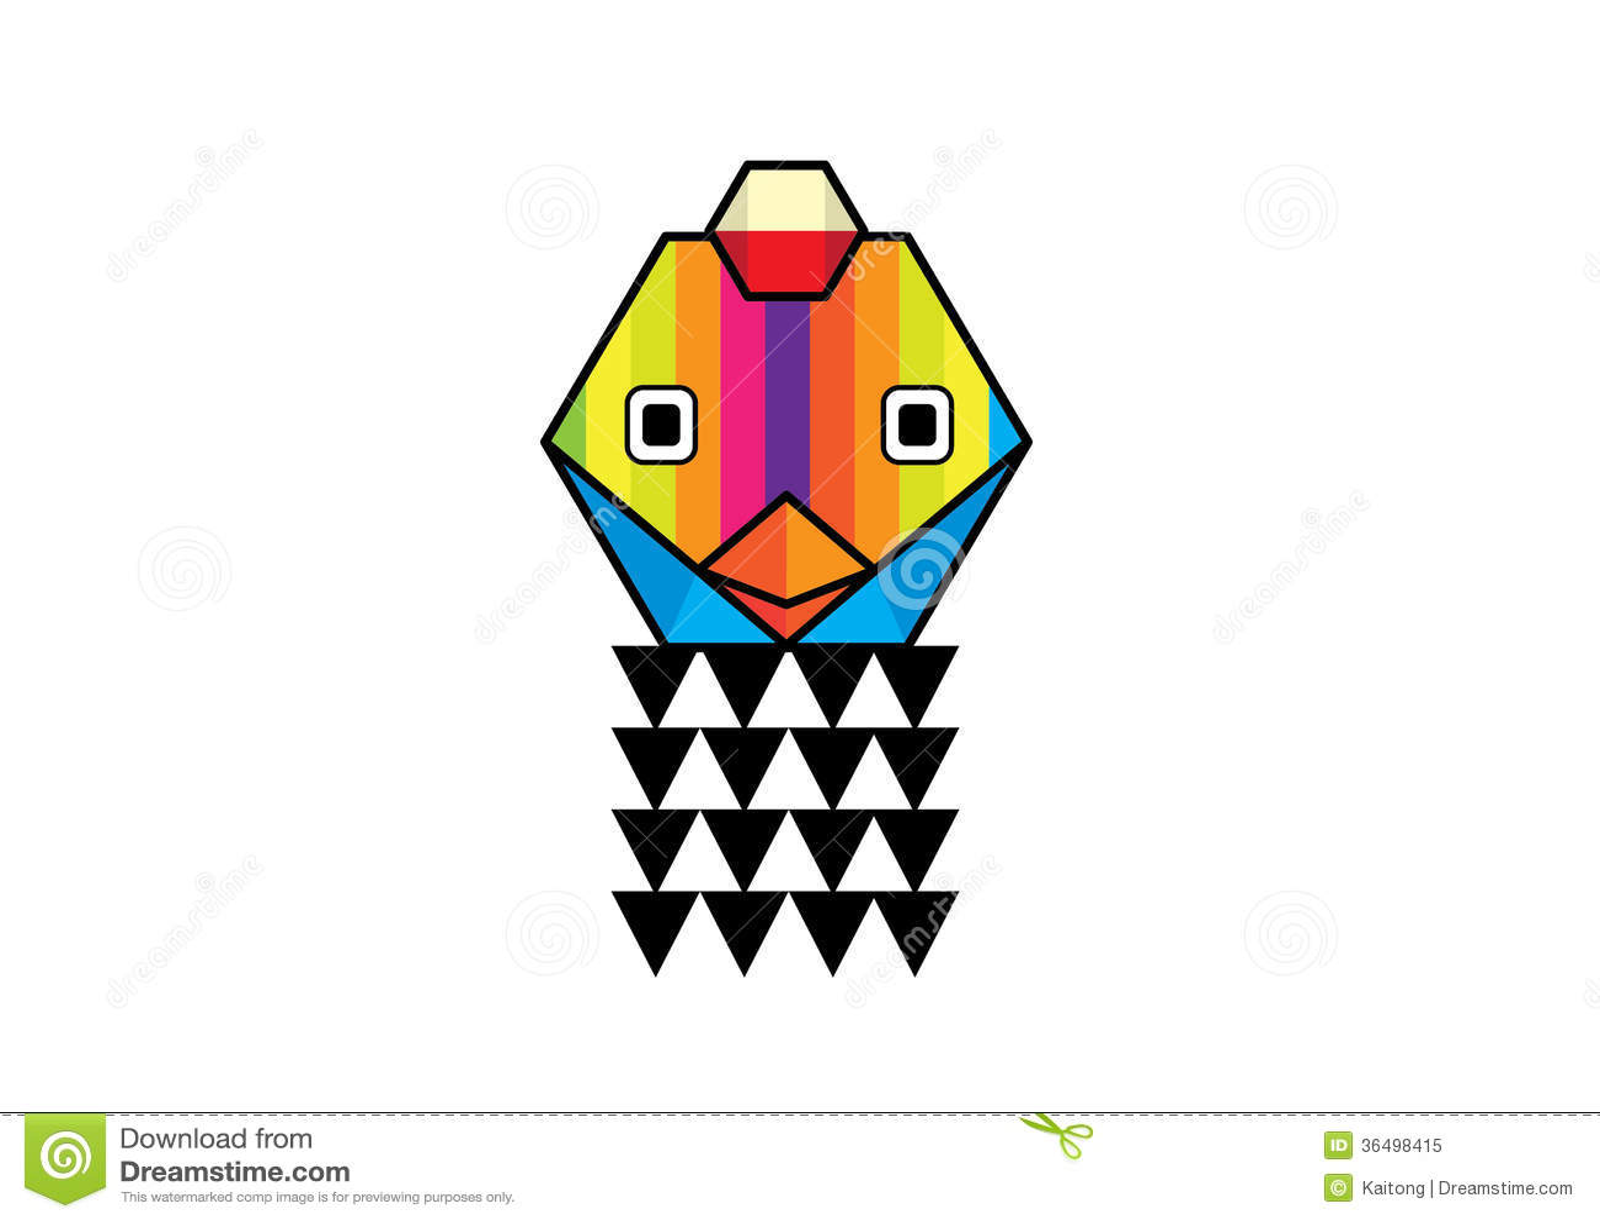 vector illustration of chicken cartoon royalty free stock photo